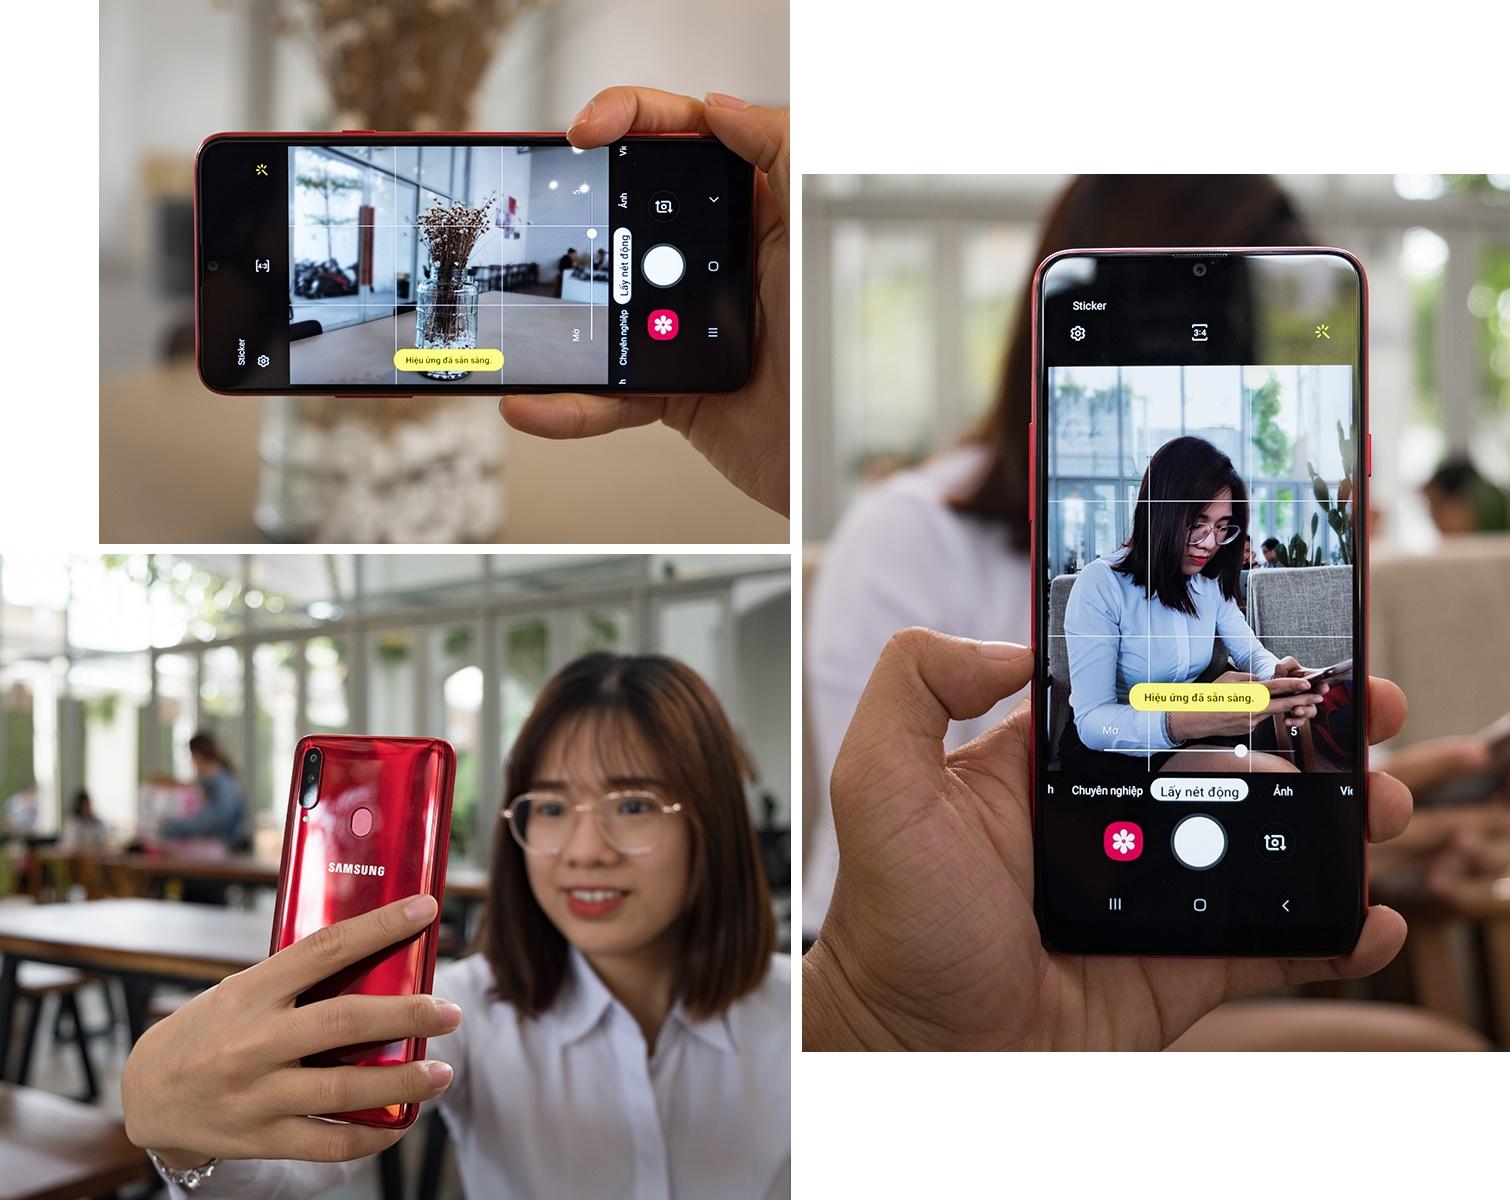 Smartphone pho thong phai co nhung dieu nay moi chieu duoc nguoi dung hinh anh 6